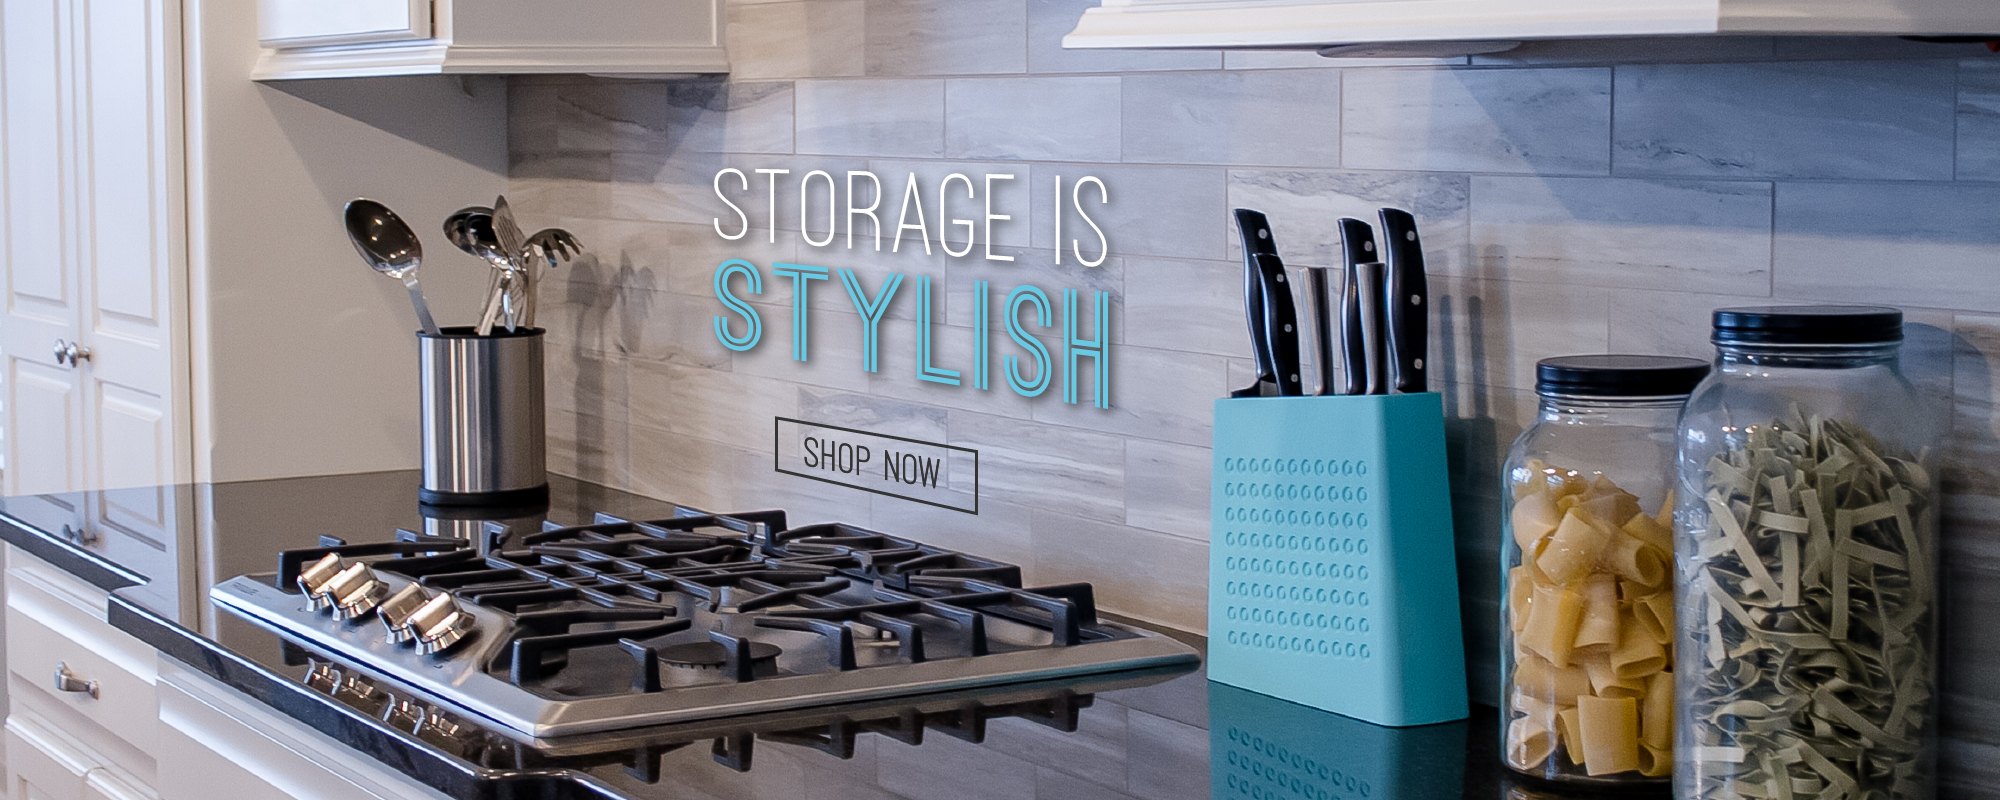 Storage is Stylish | Kapoosh Urban